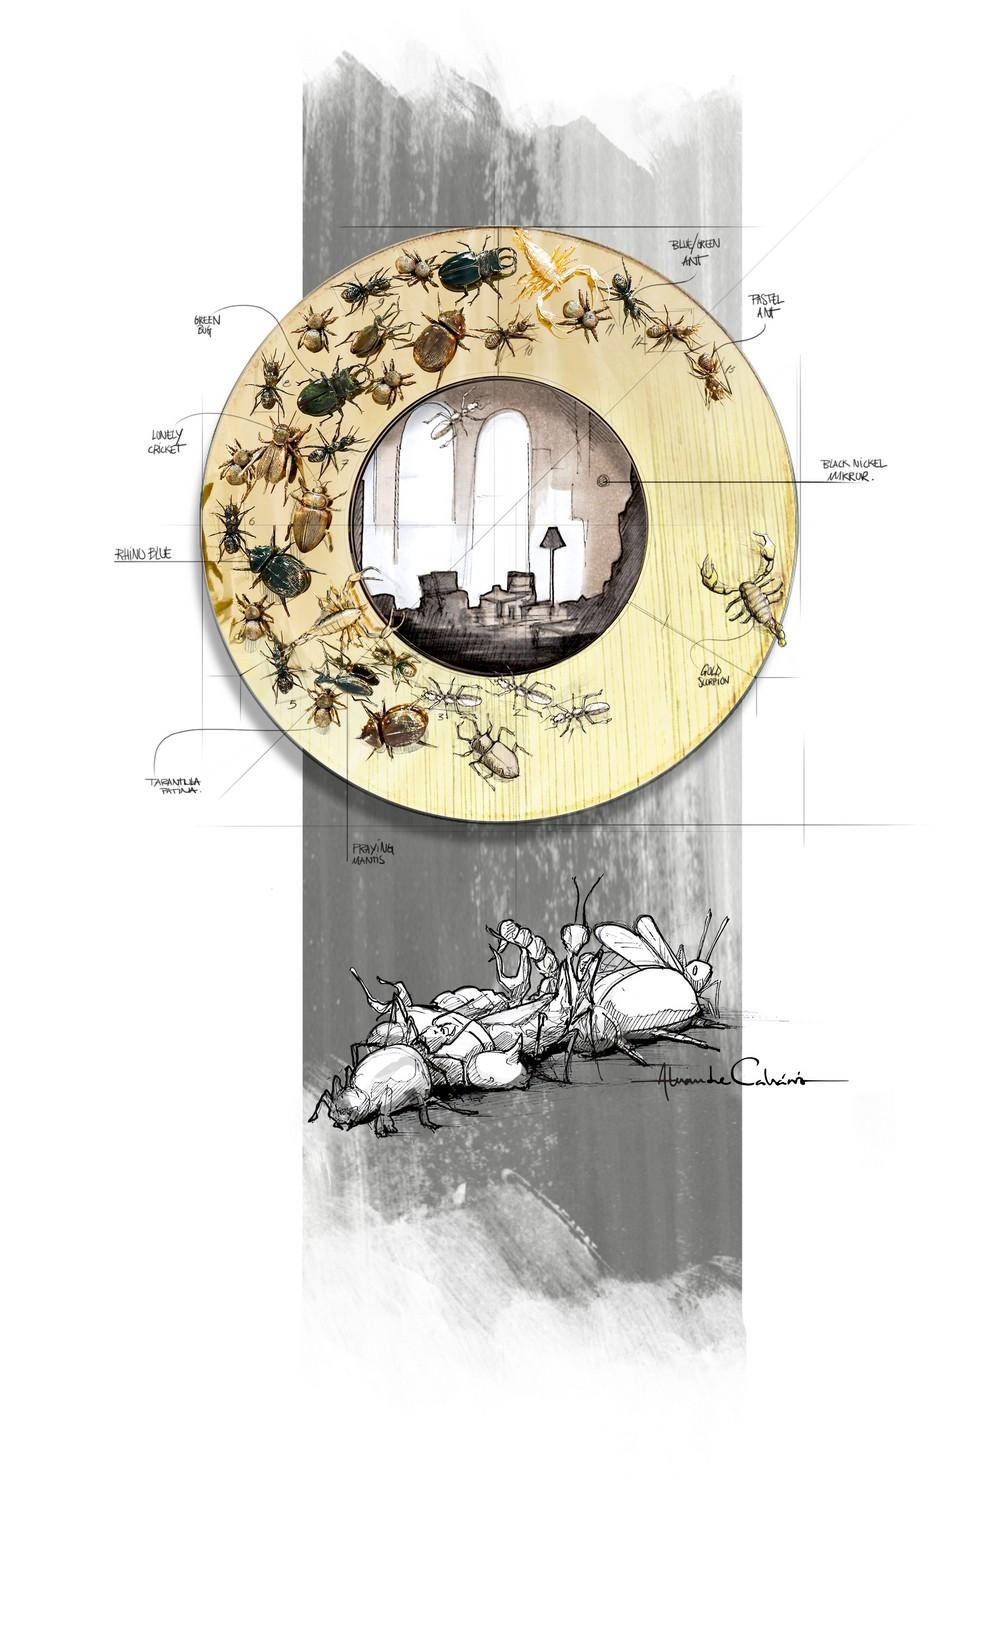 Furniture Boca do Lobo Furniture: Metamorphosis Family metamorphosis mirror sketch